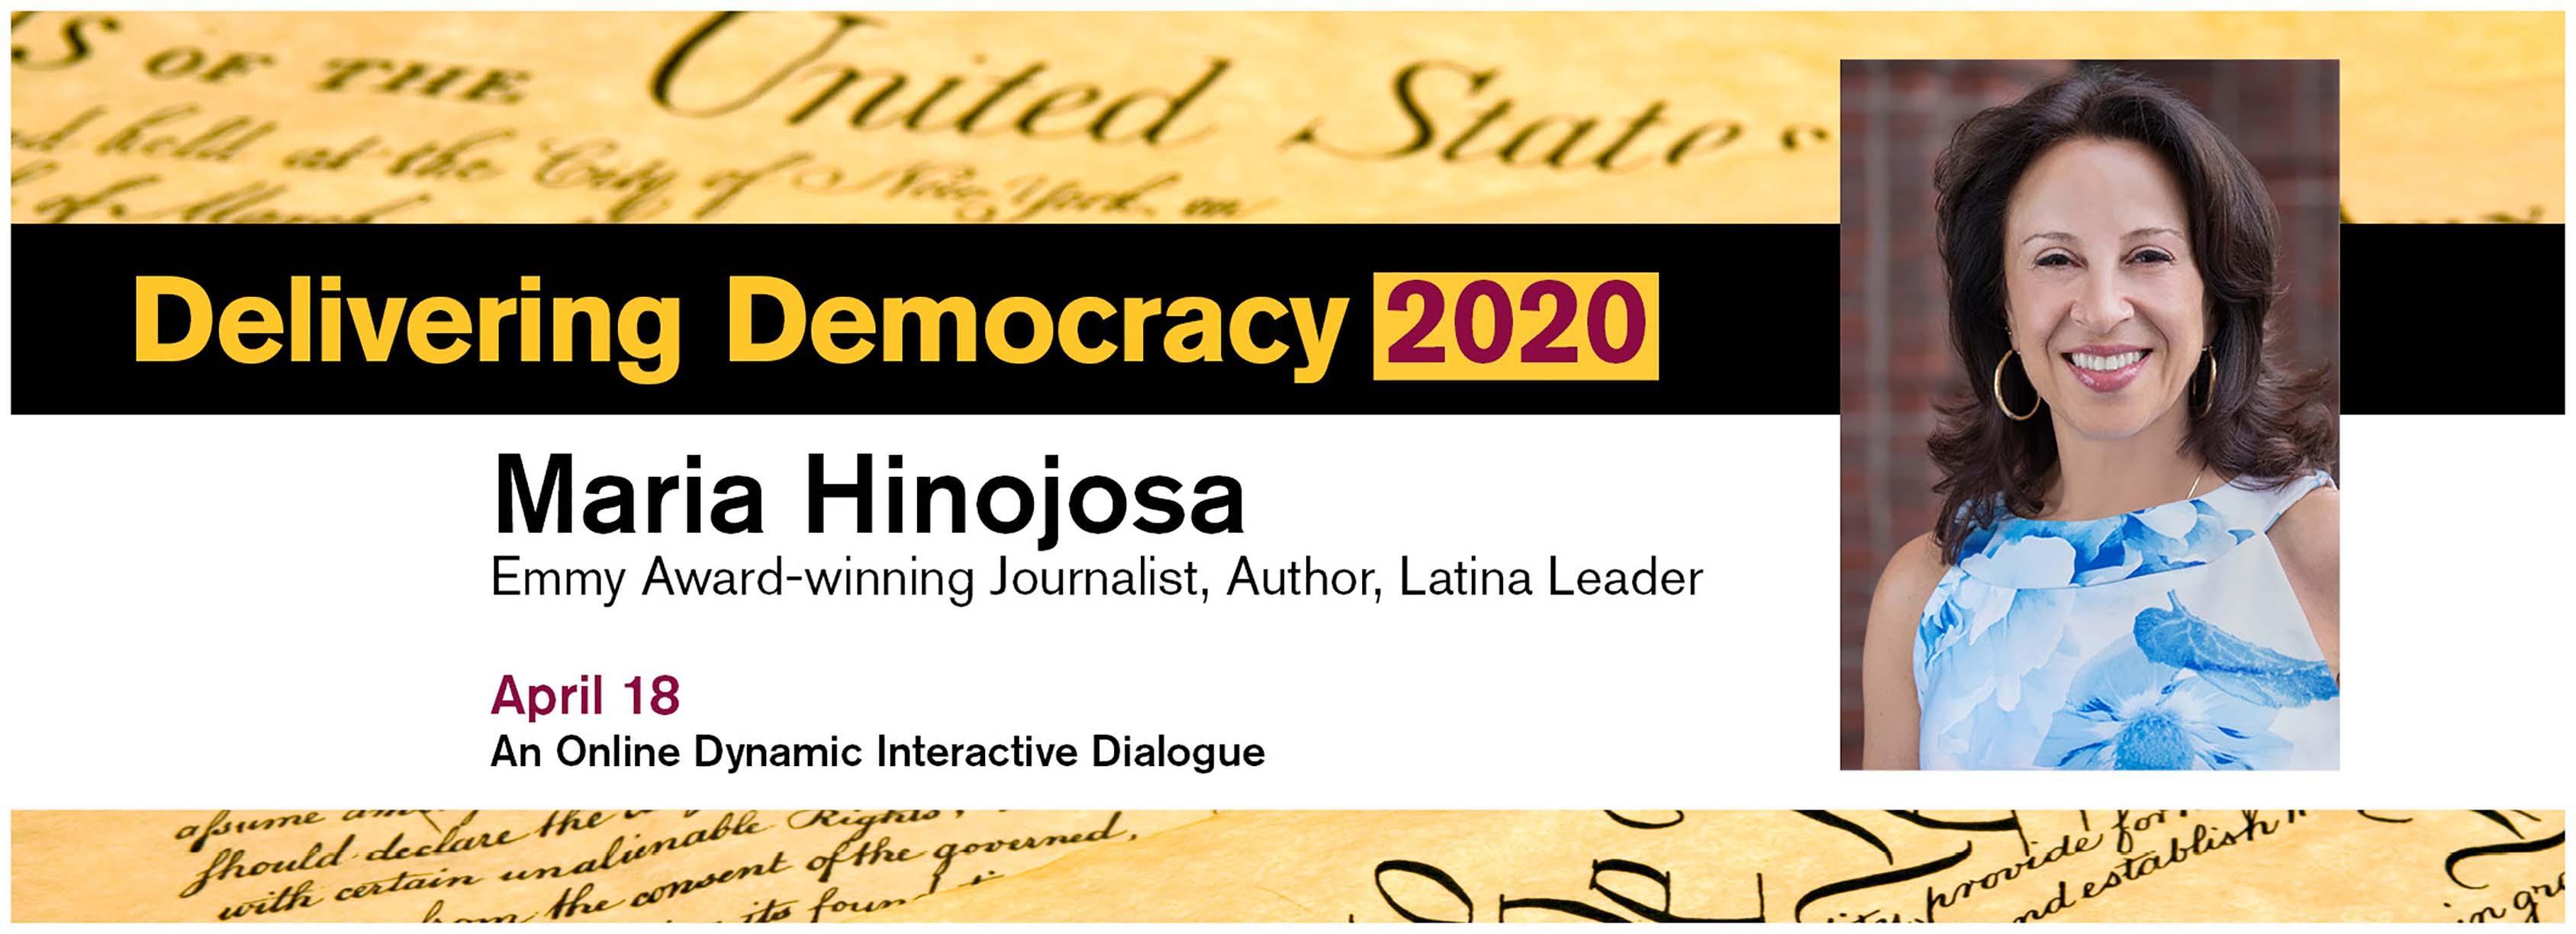 Maria Hinojosa Emmy Award winning Journalist, Author, Latina Leader